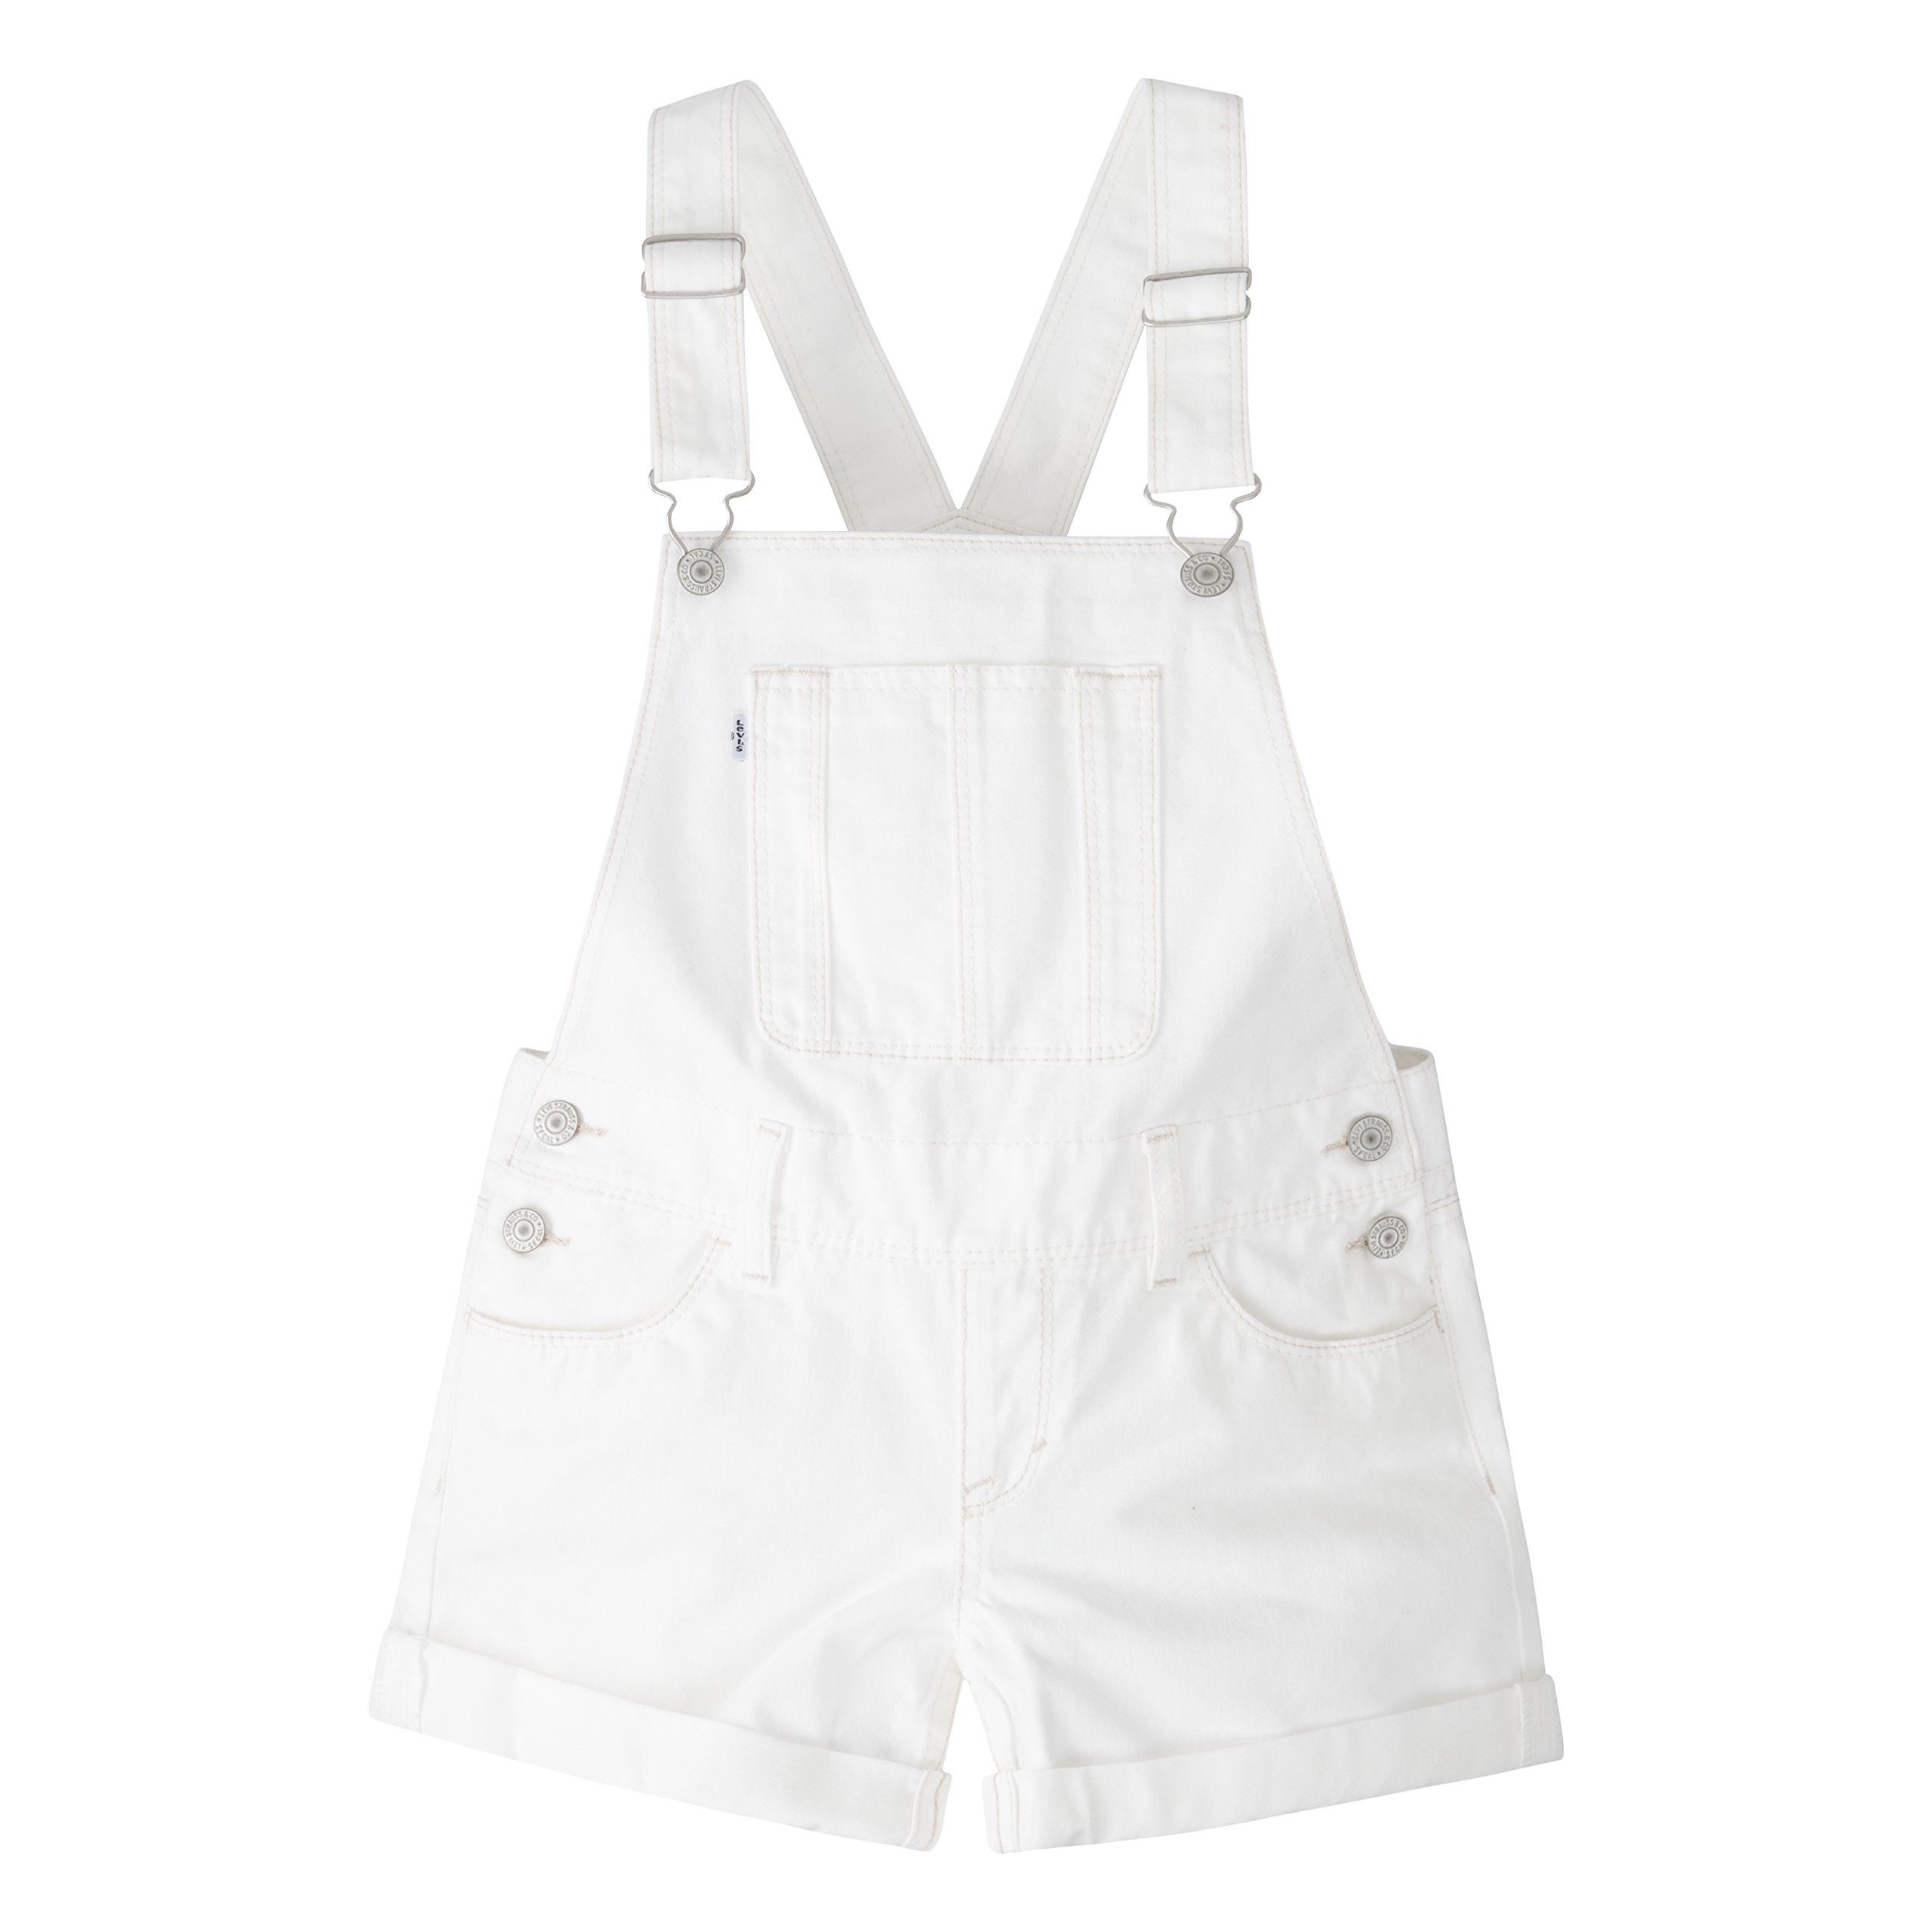 Levi's Girls' Big Denim Shortalls, White, 12 by Levi's